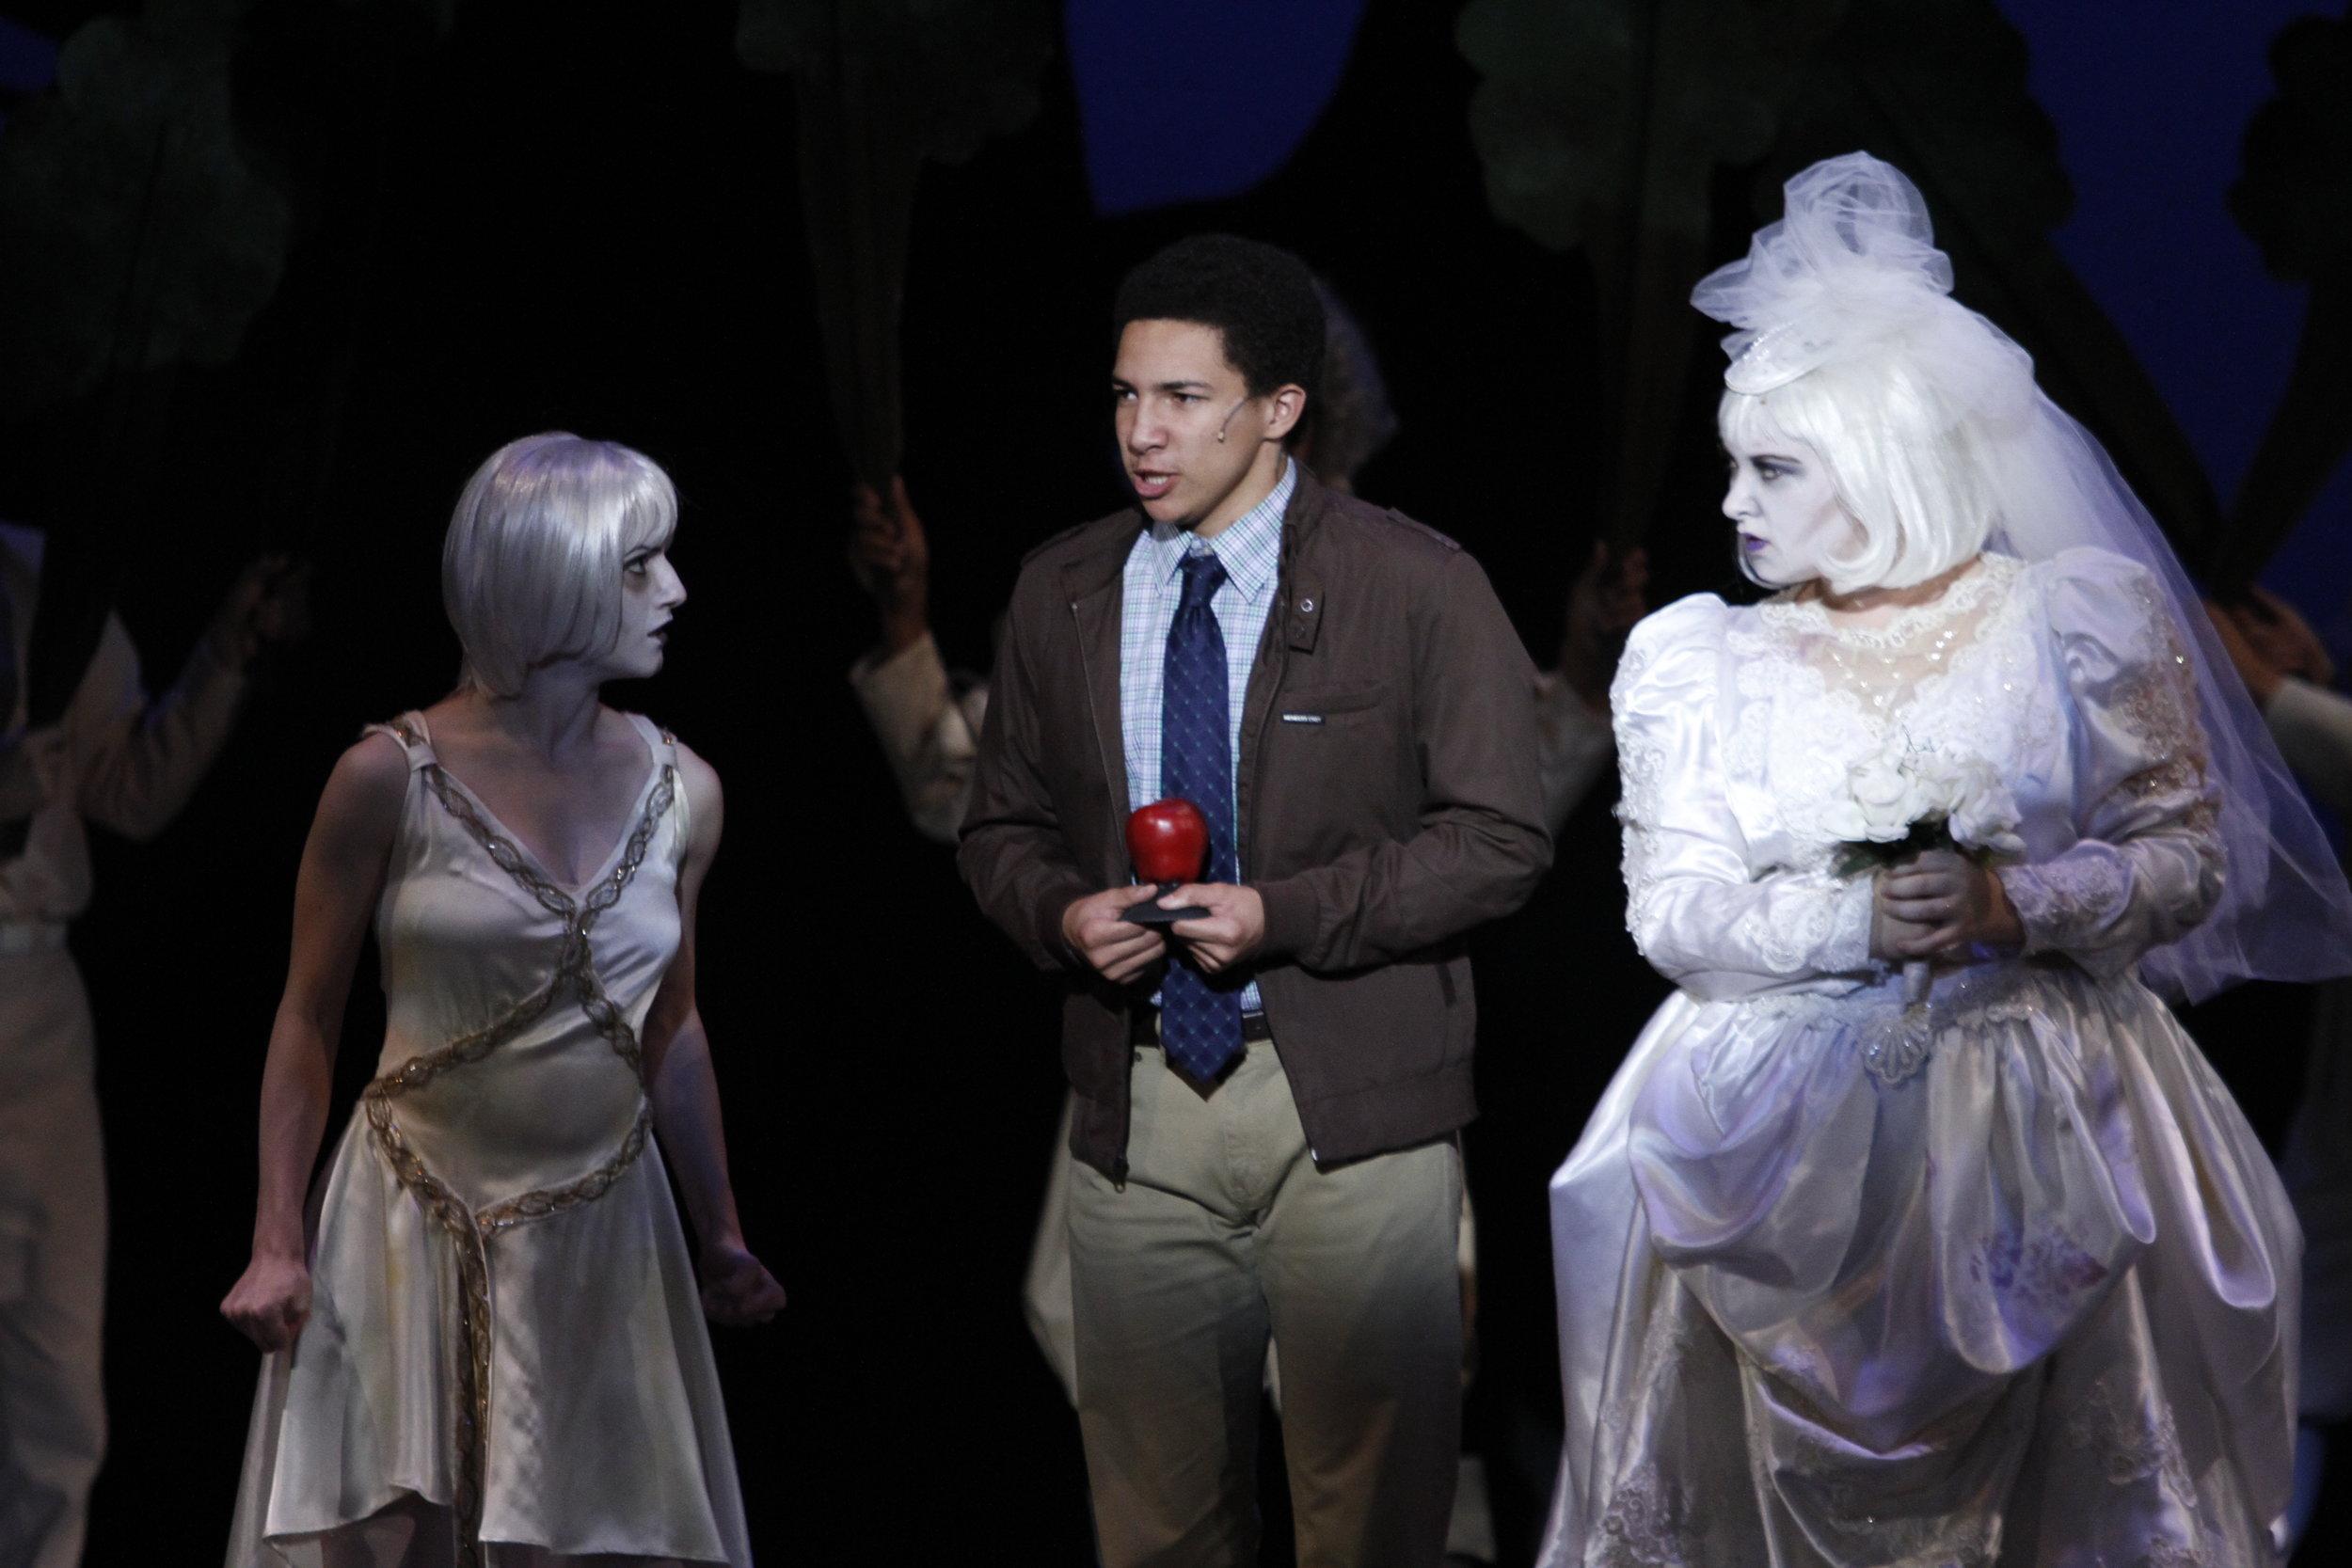 Bride Ancestor in The Addams Family